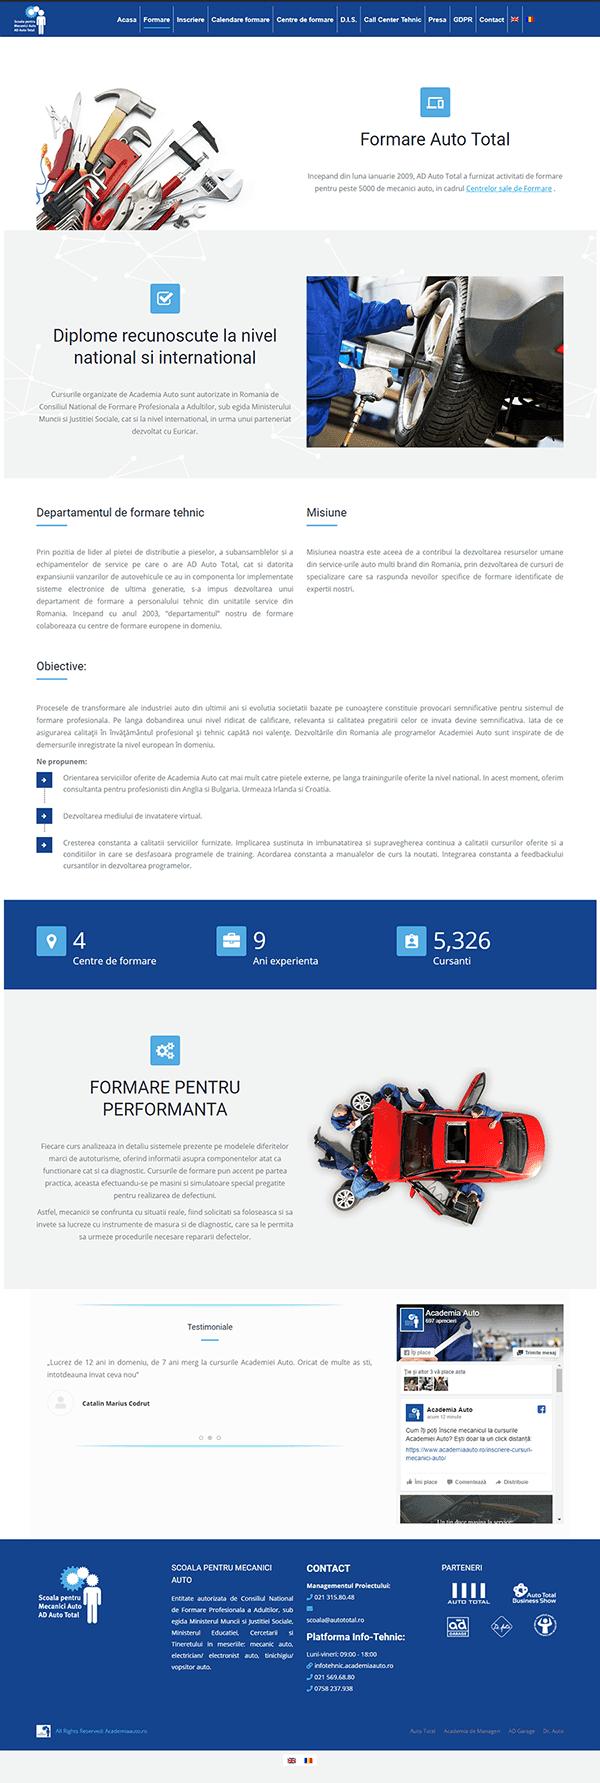 Inovateam web design -academiaauto (3)